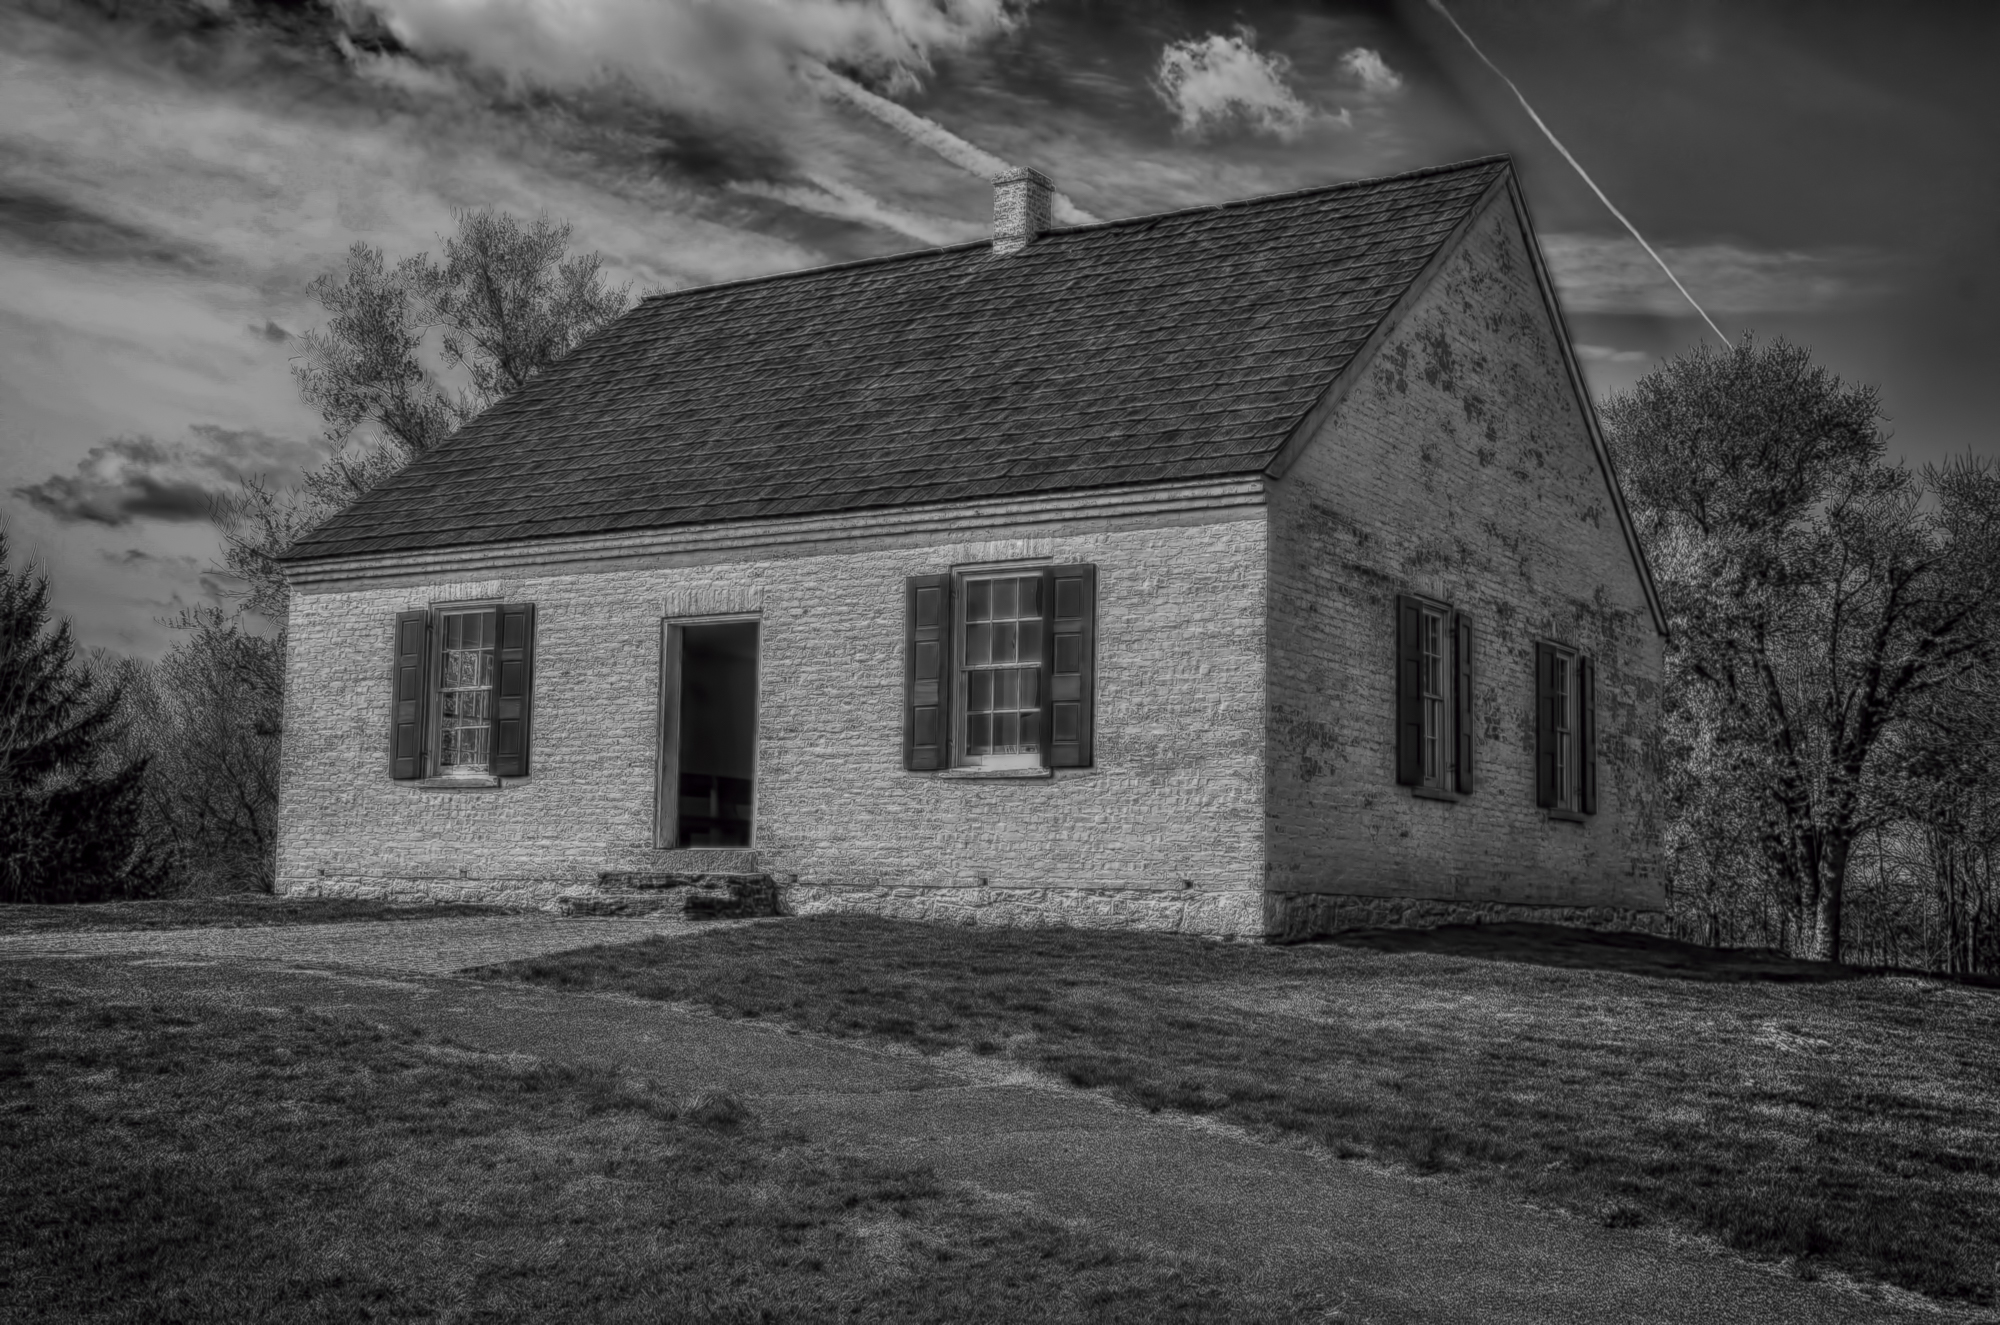 Dunker Church - Nikon D7000, 1/160 @f/11, ISO 100, 28mm - Antietam National Battlefield - See the poem, Antietam Creek in the Poetry Blog!